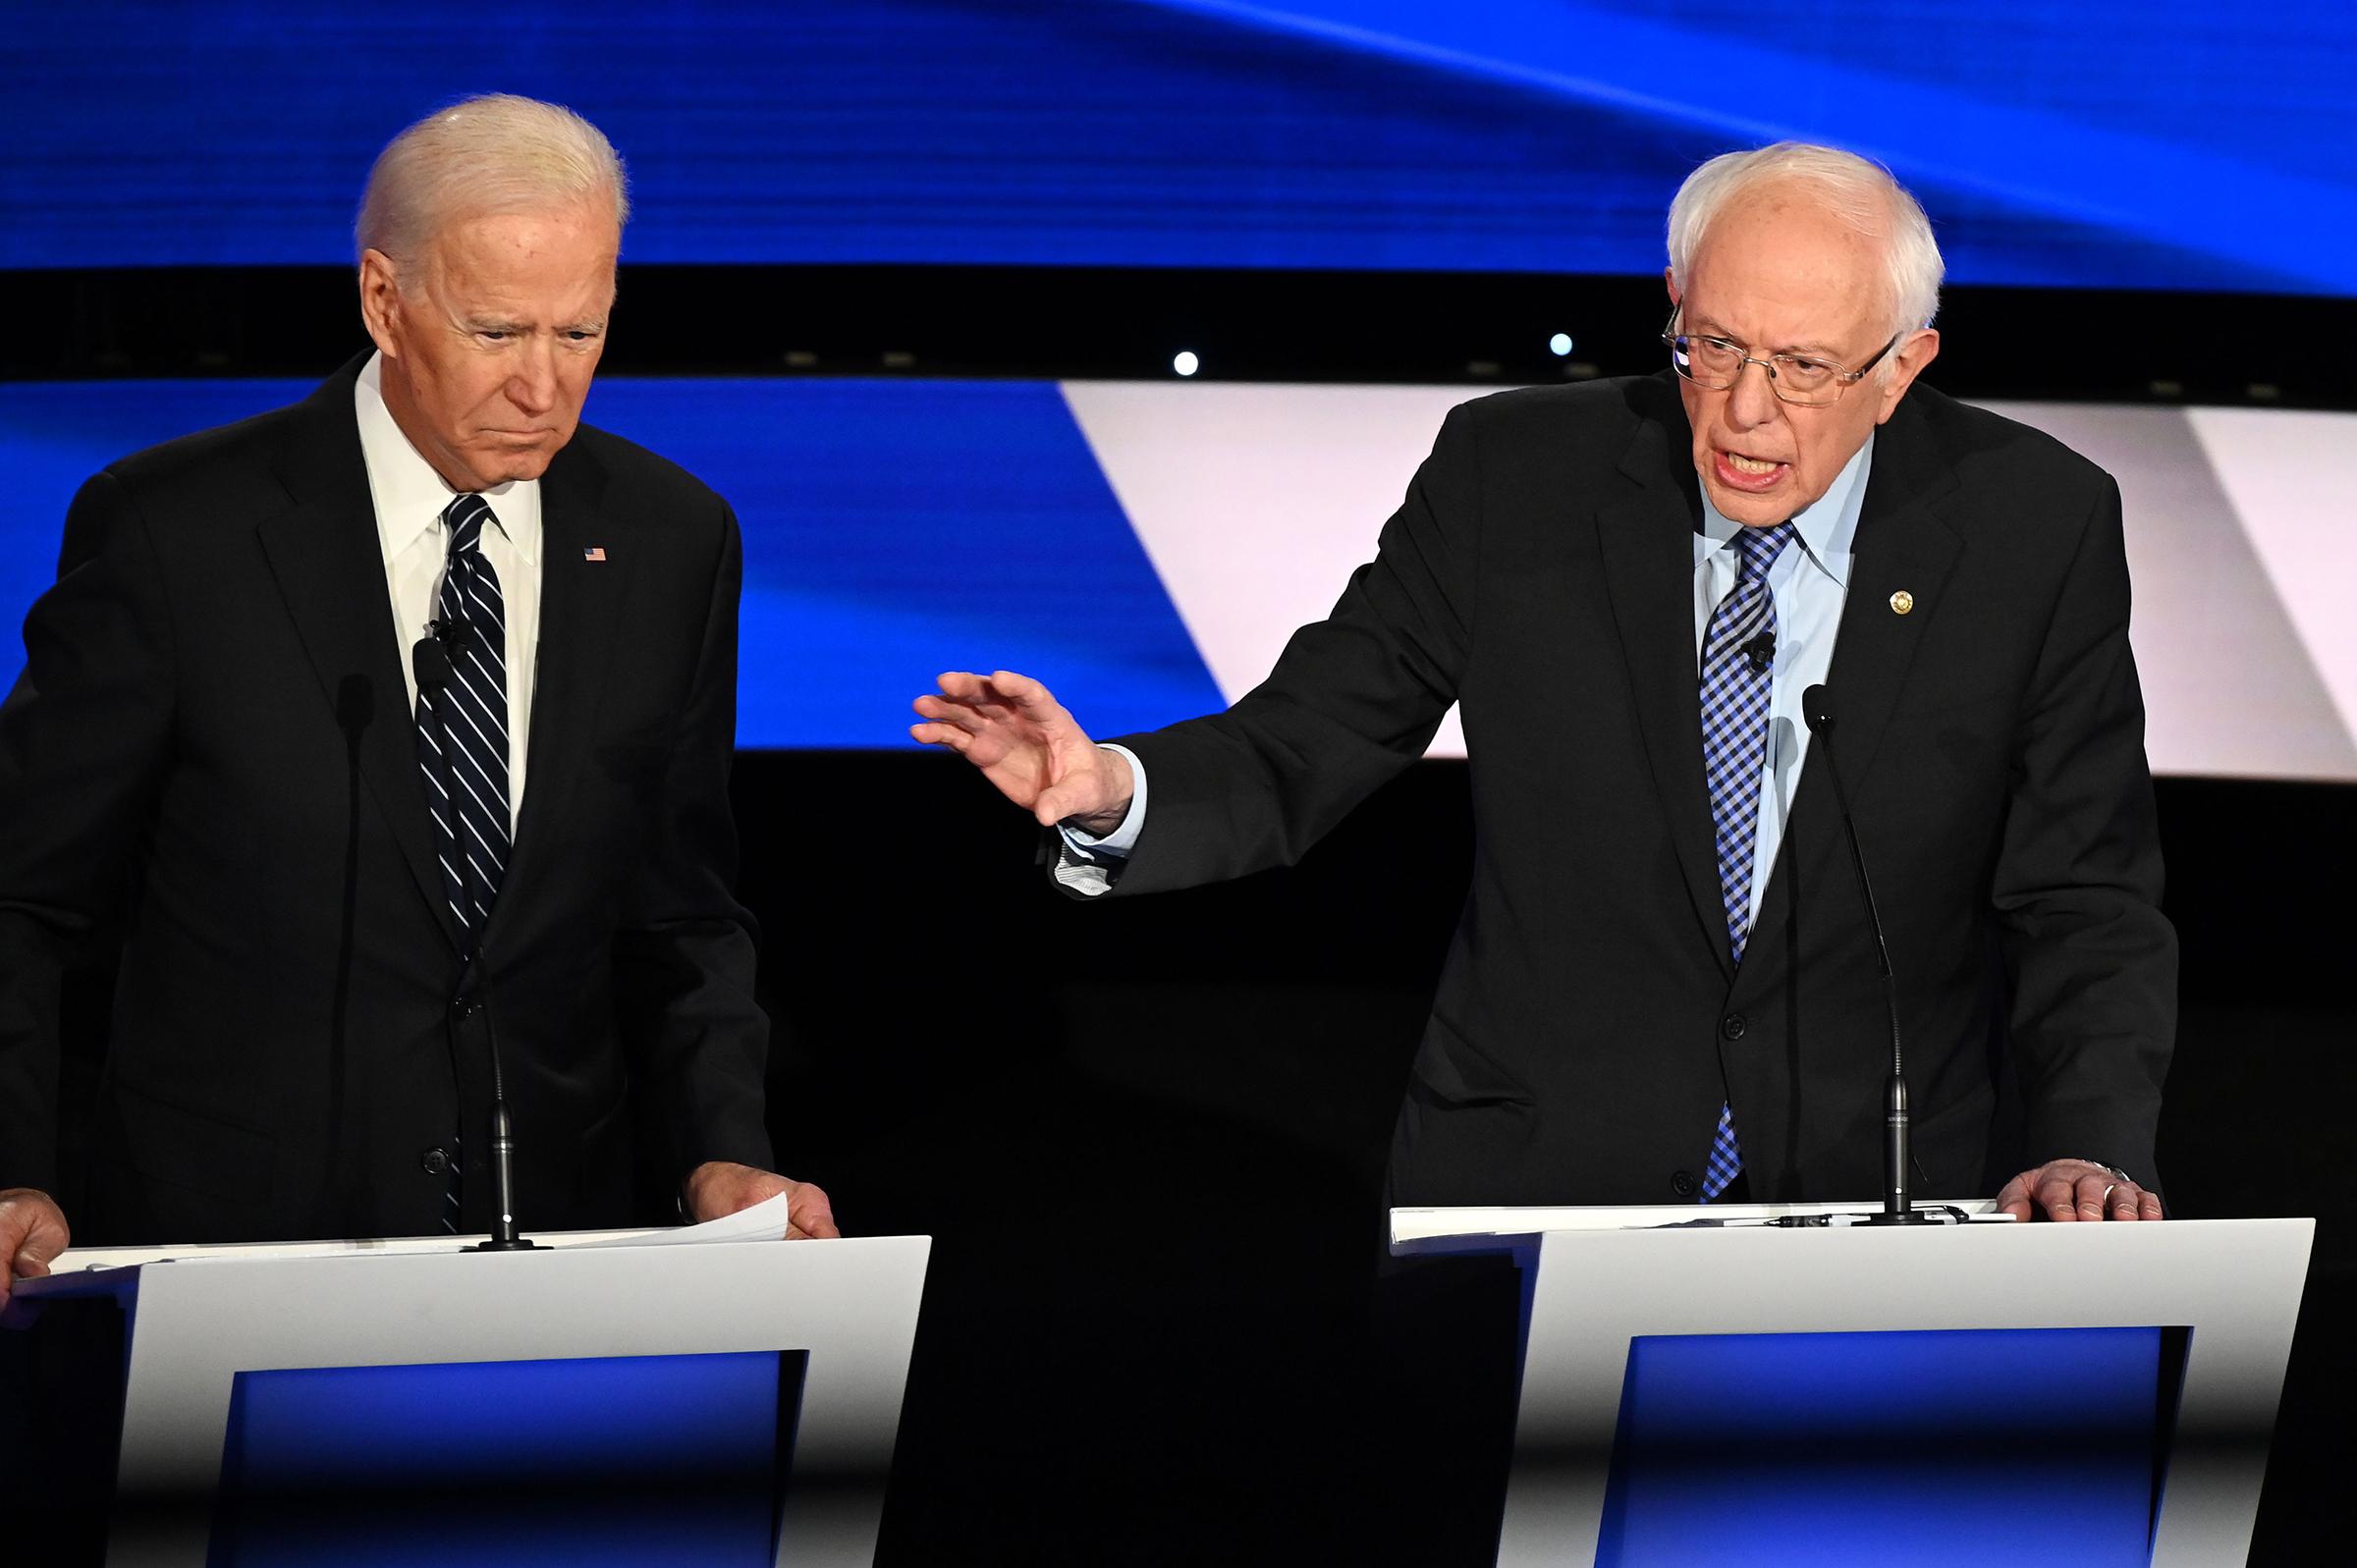 (L-R) Democratic presidential hopefuls Former Vice President Joe Biden (L) and Vermont Senator Bernie Sanders participate in the seventh Democratic primary debate of the 2020 presidential campaign in Des Moines, Iowa on Jan. 14, 2020.